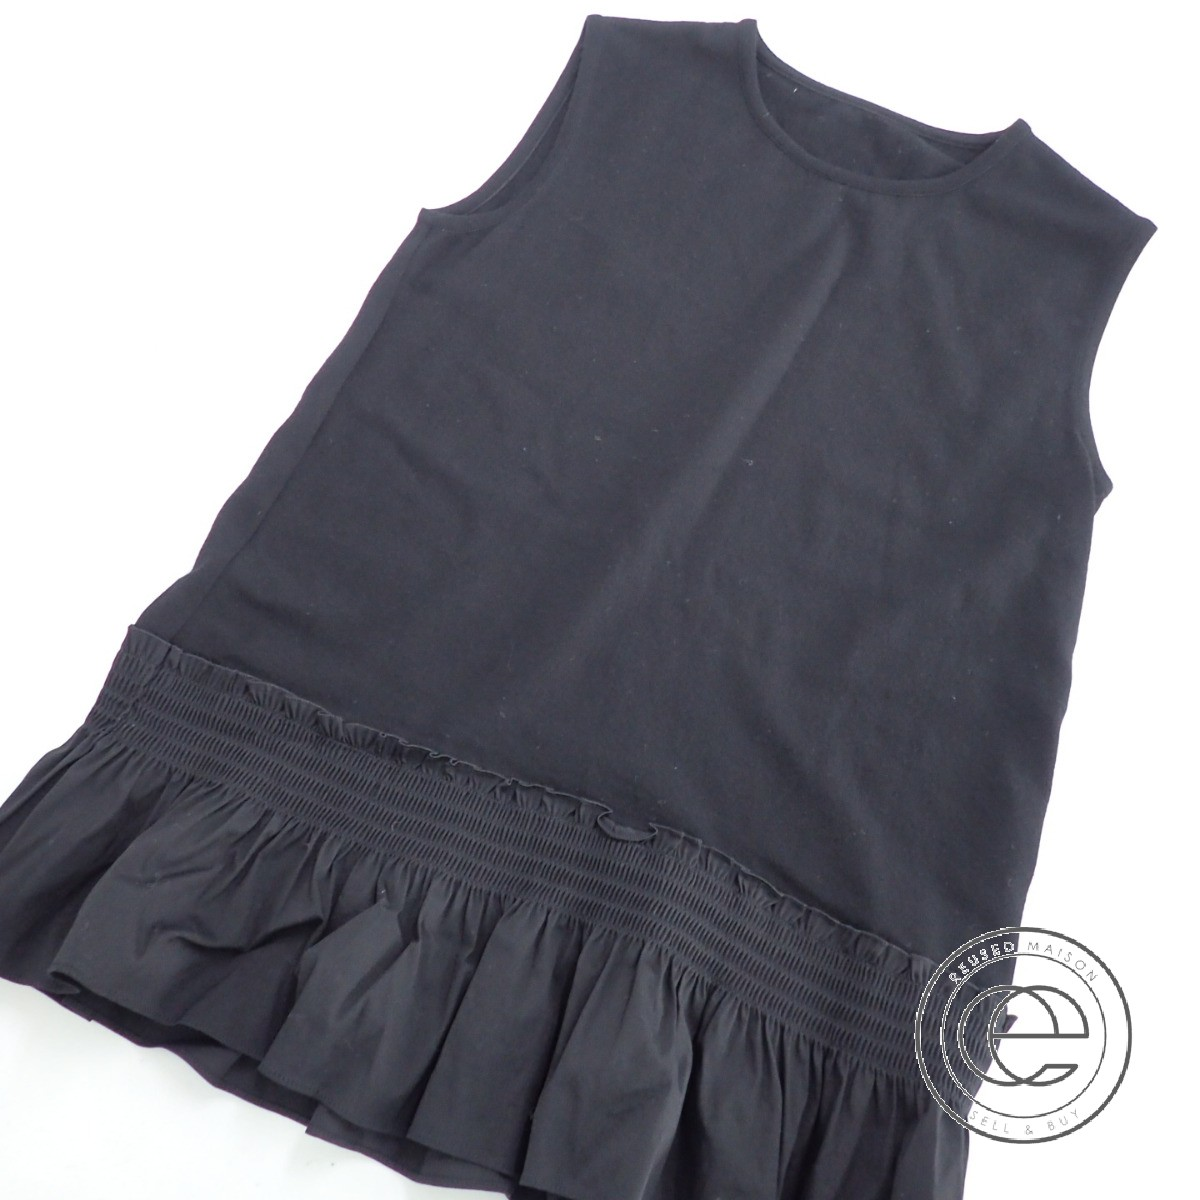 FOXEY フォクシー 36839 Smocking A-Line Knit Top スモッキングAライン ノースリーブ ニット トップス40 ブラック レディース 【中古】